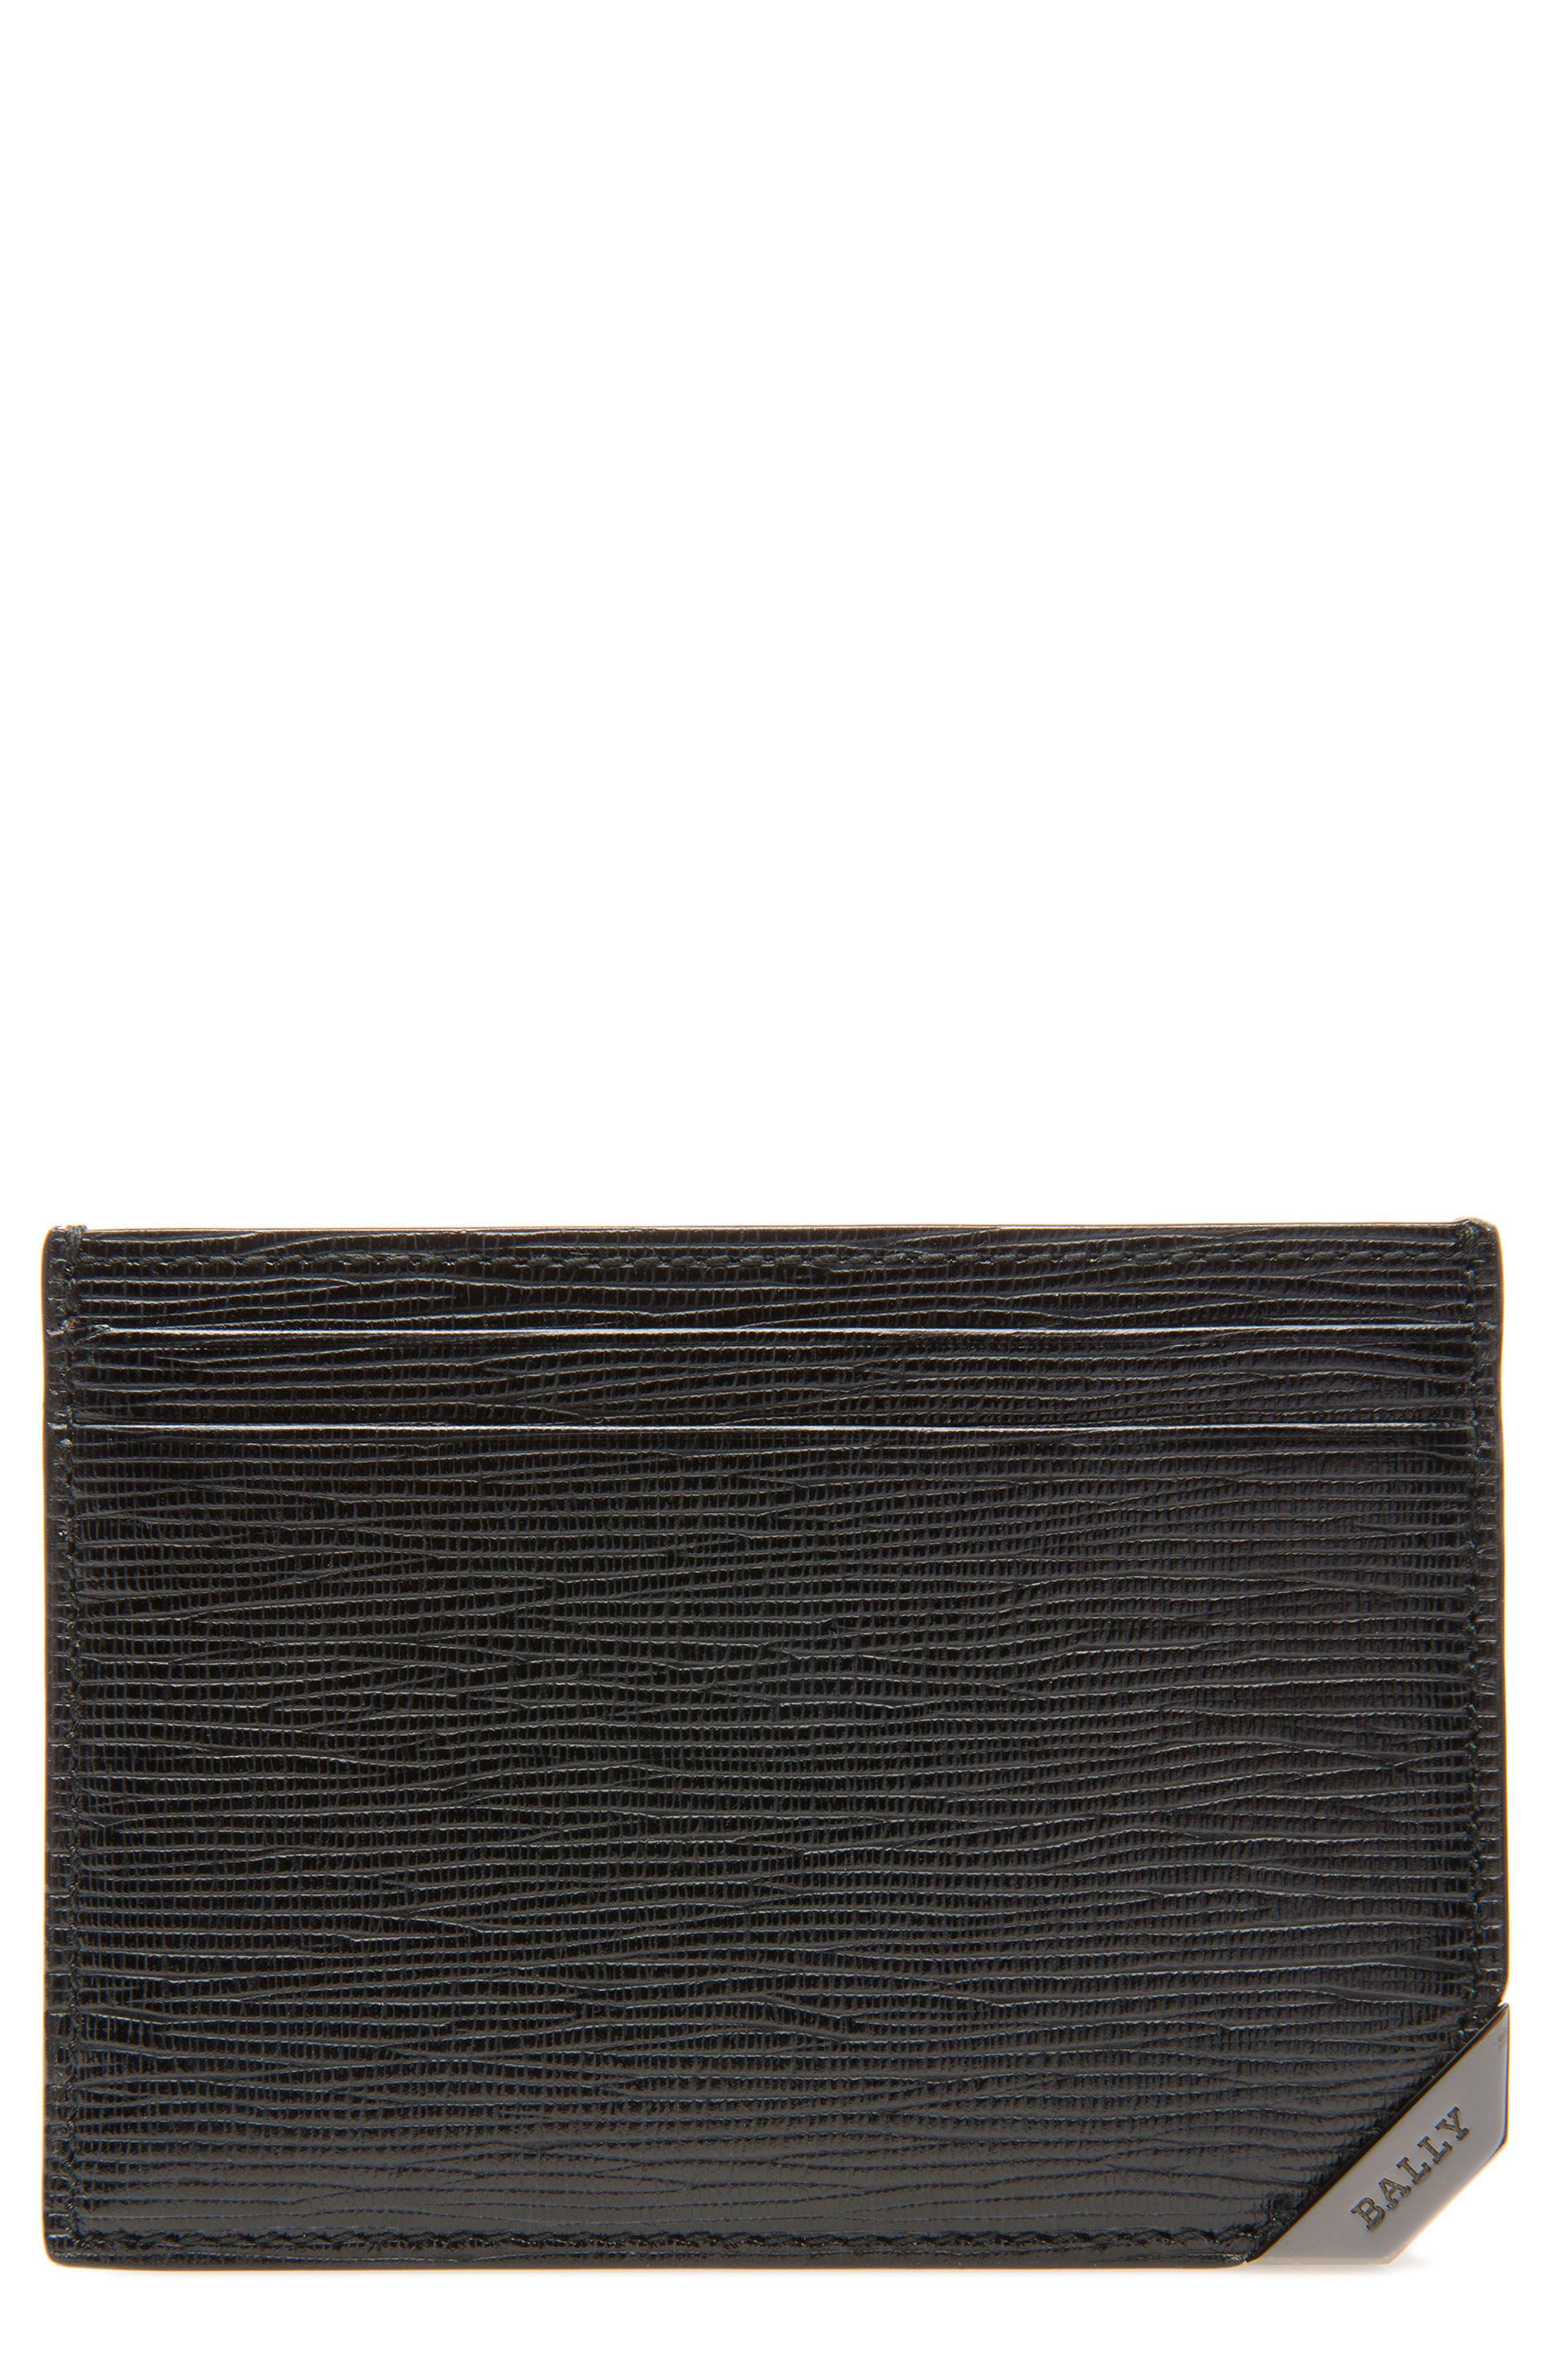 Bhar Leather Card Holder,                             Main thumbnail 1, color,                             Black